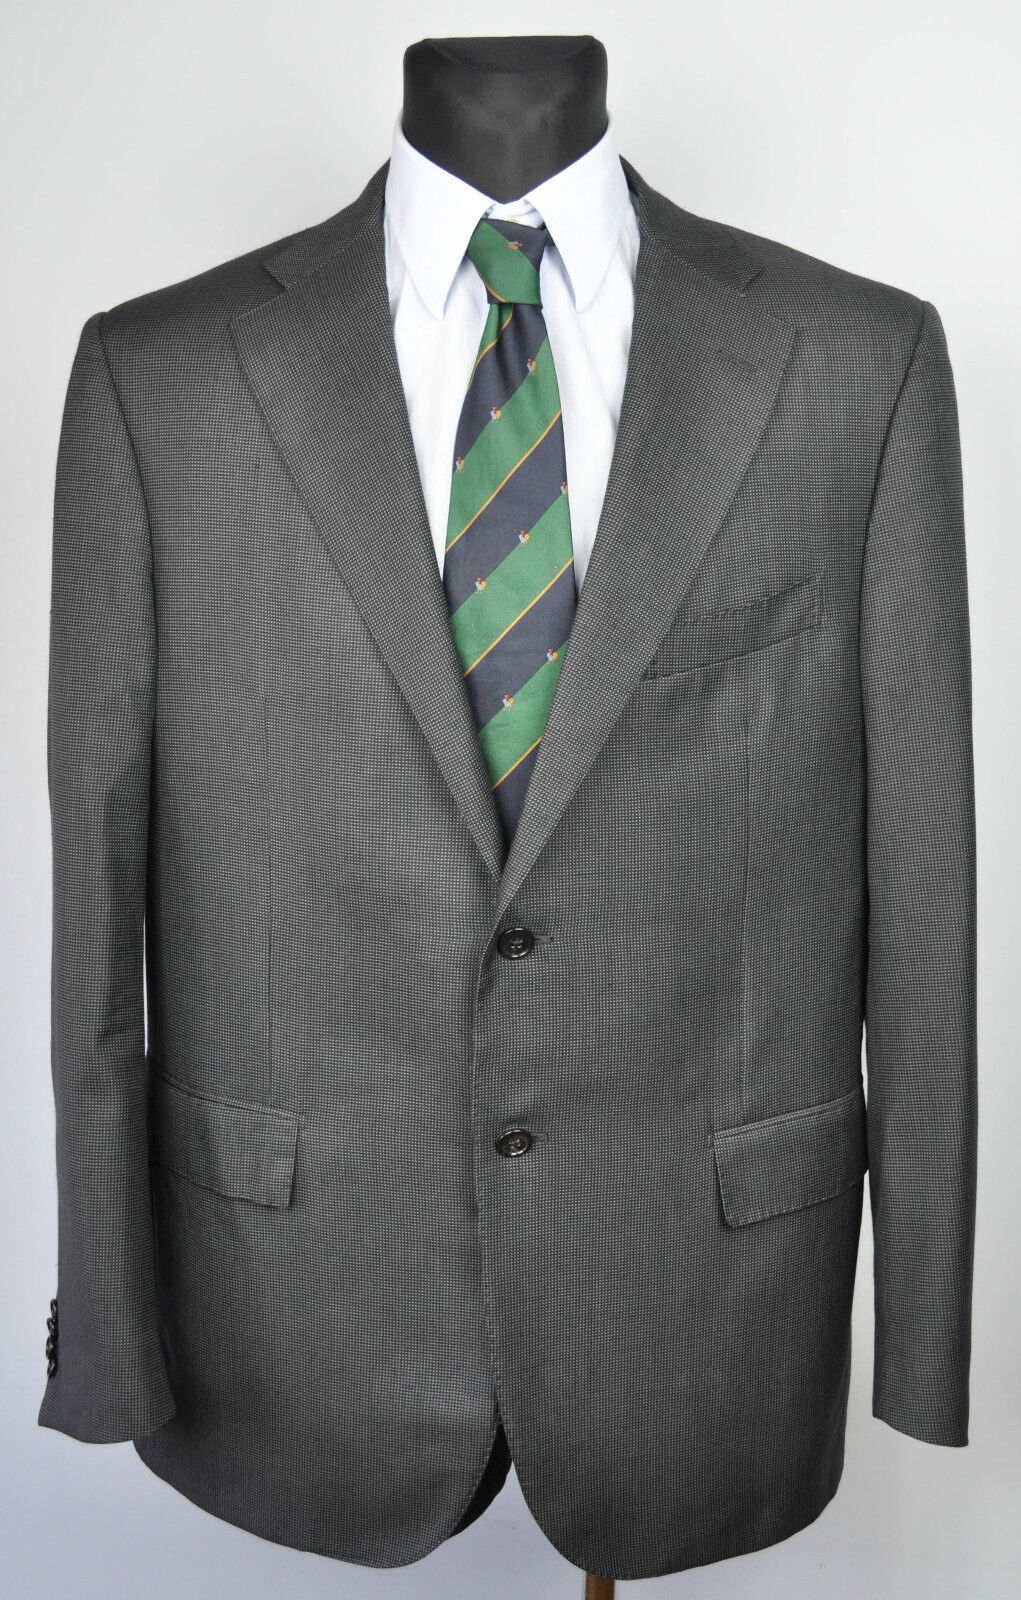 CORNELIANI Pattern Blazer 20% SILK & 80% wolleUK 44R jacke EU 54R Coat Suit